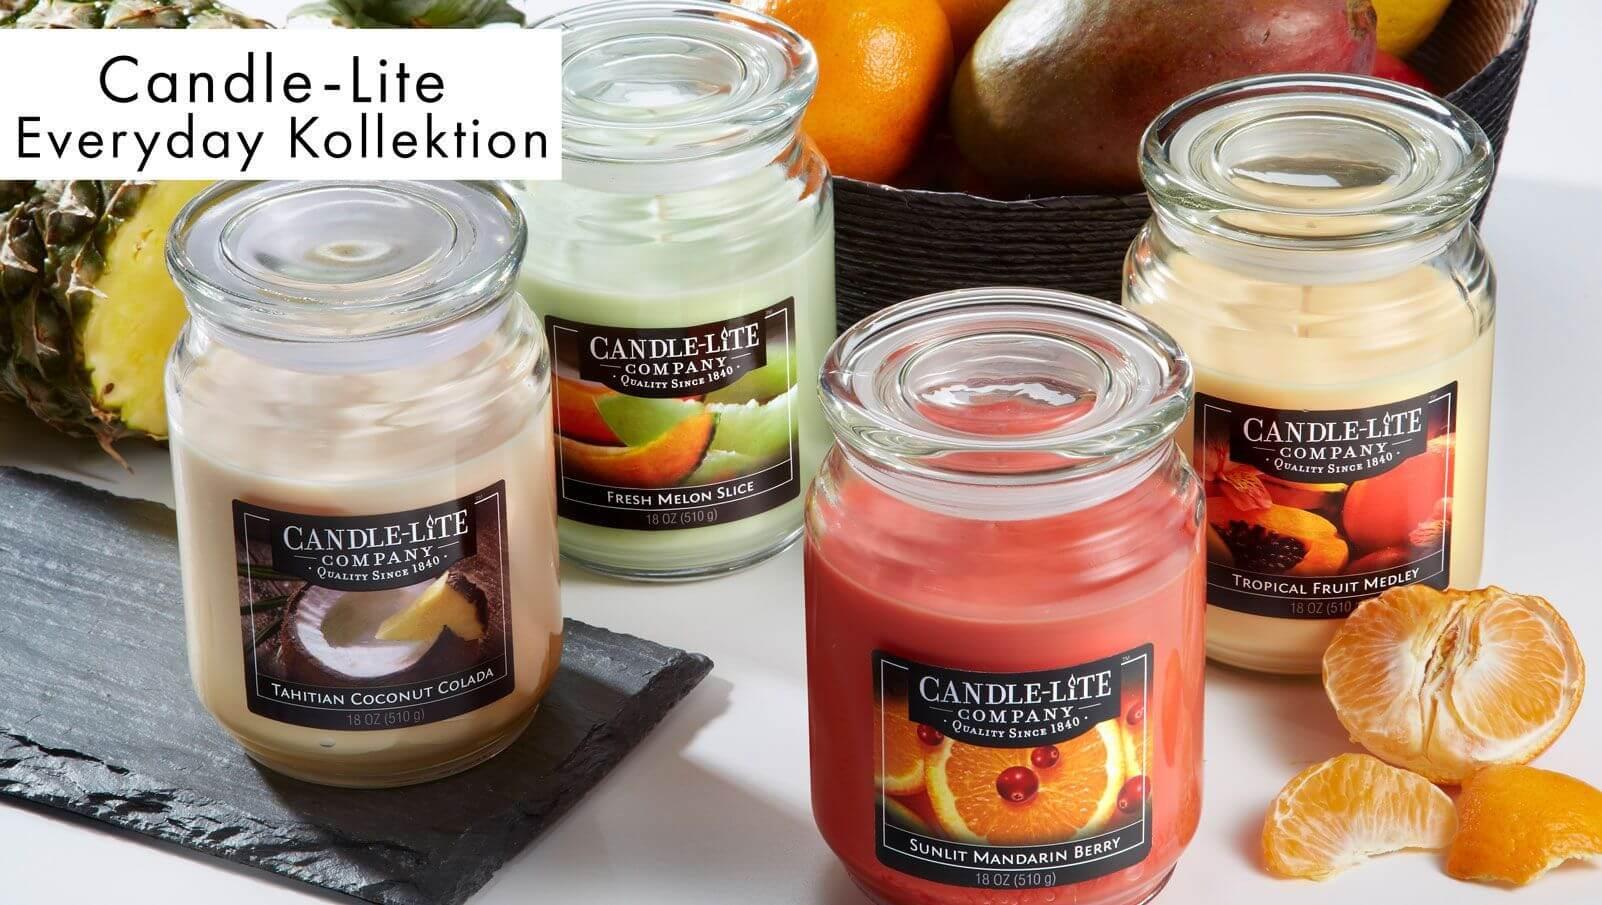 candle-lite-duftkerzen-kaufen